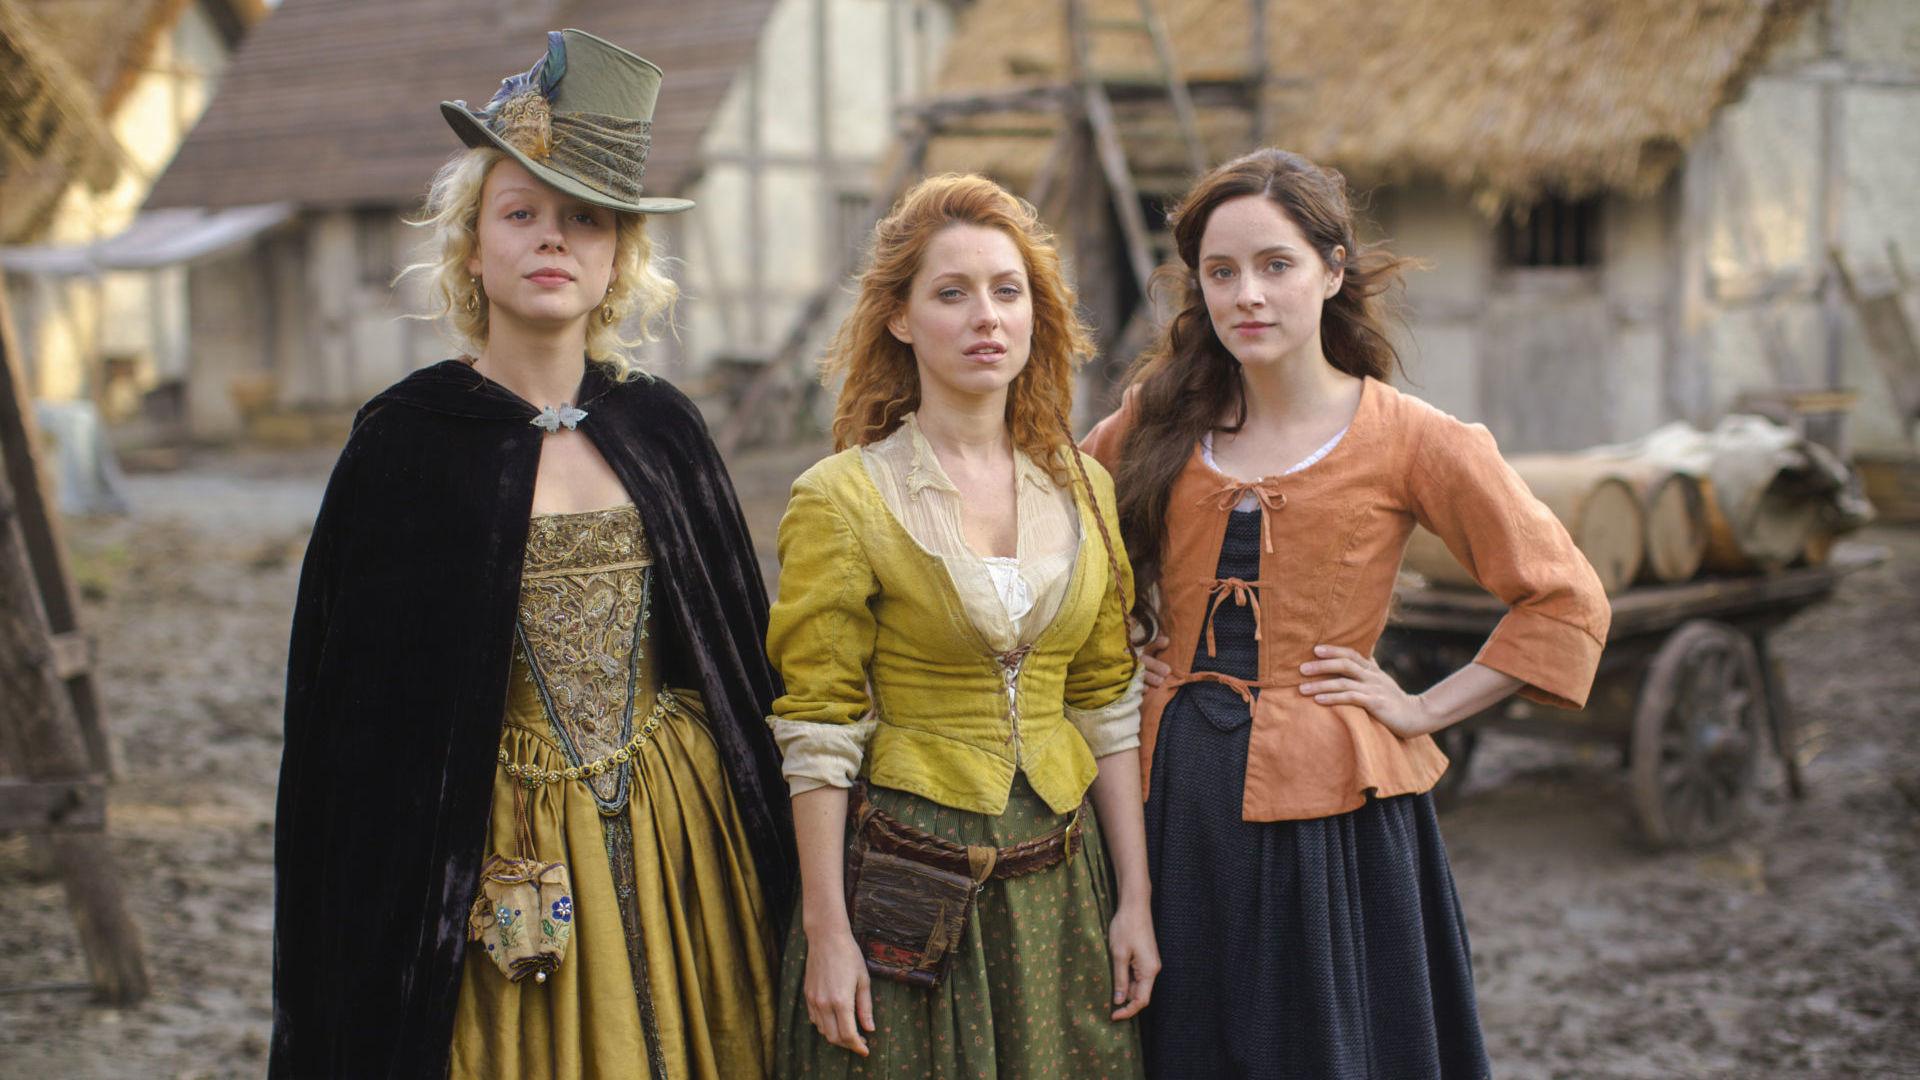 The women of jamestown